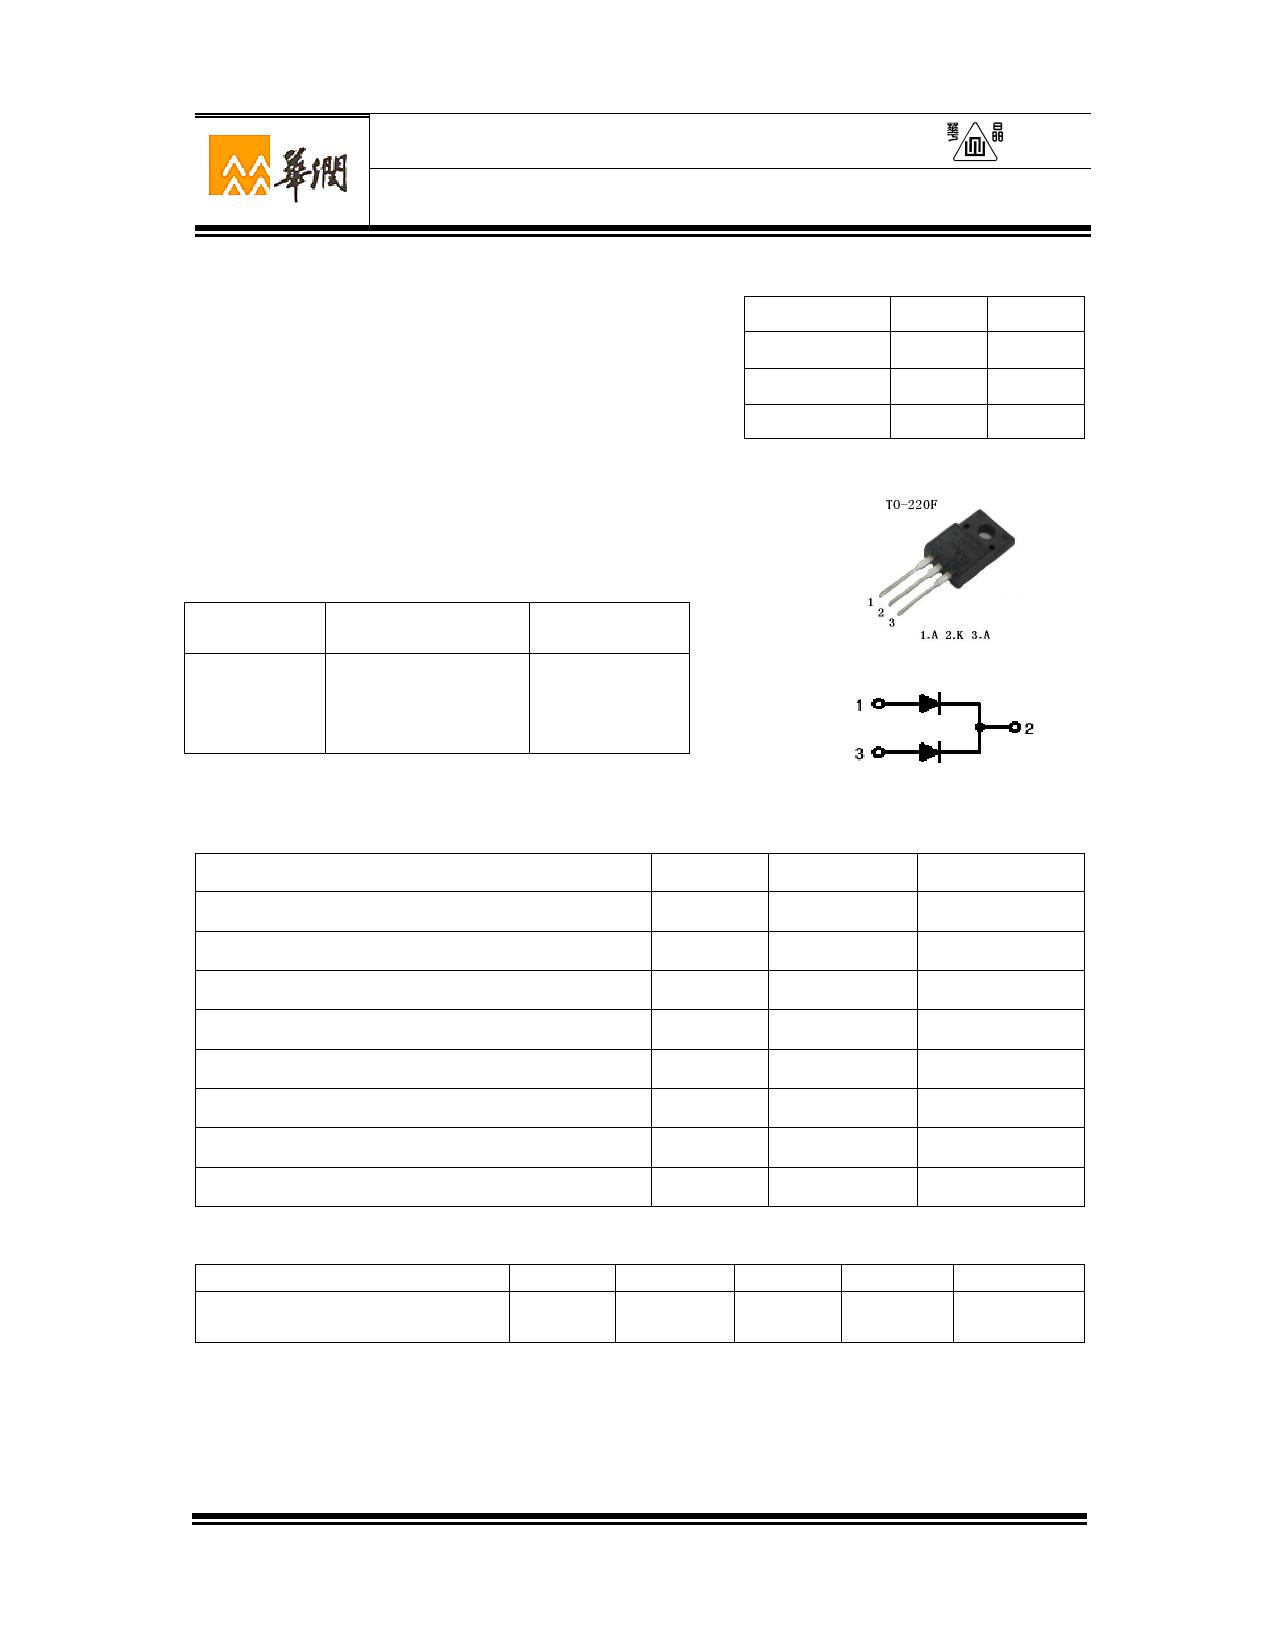 2CZ20100A9S Datasheet, 2CZ20100A9S PDF,ピン配置, 機能